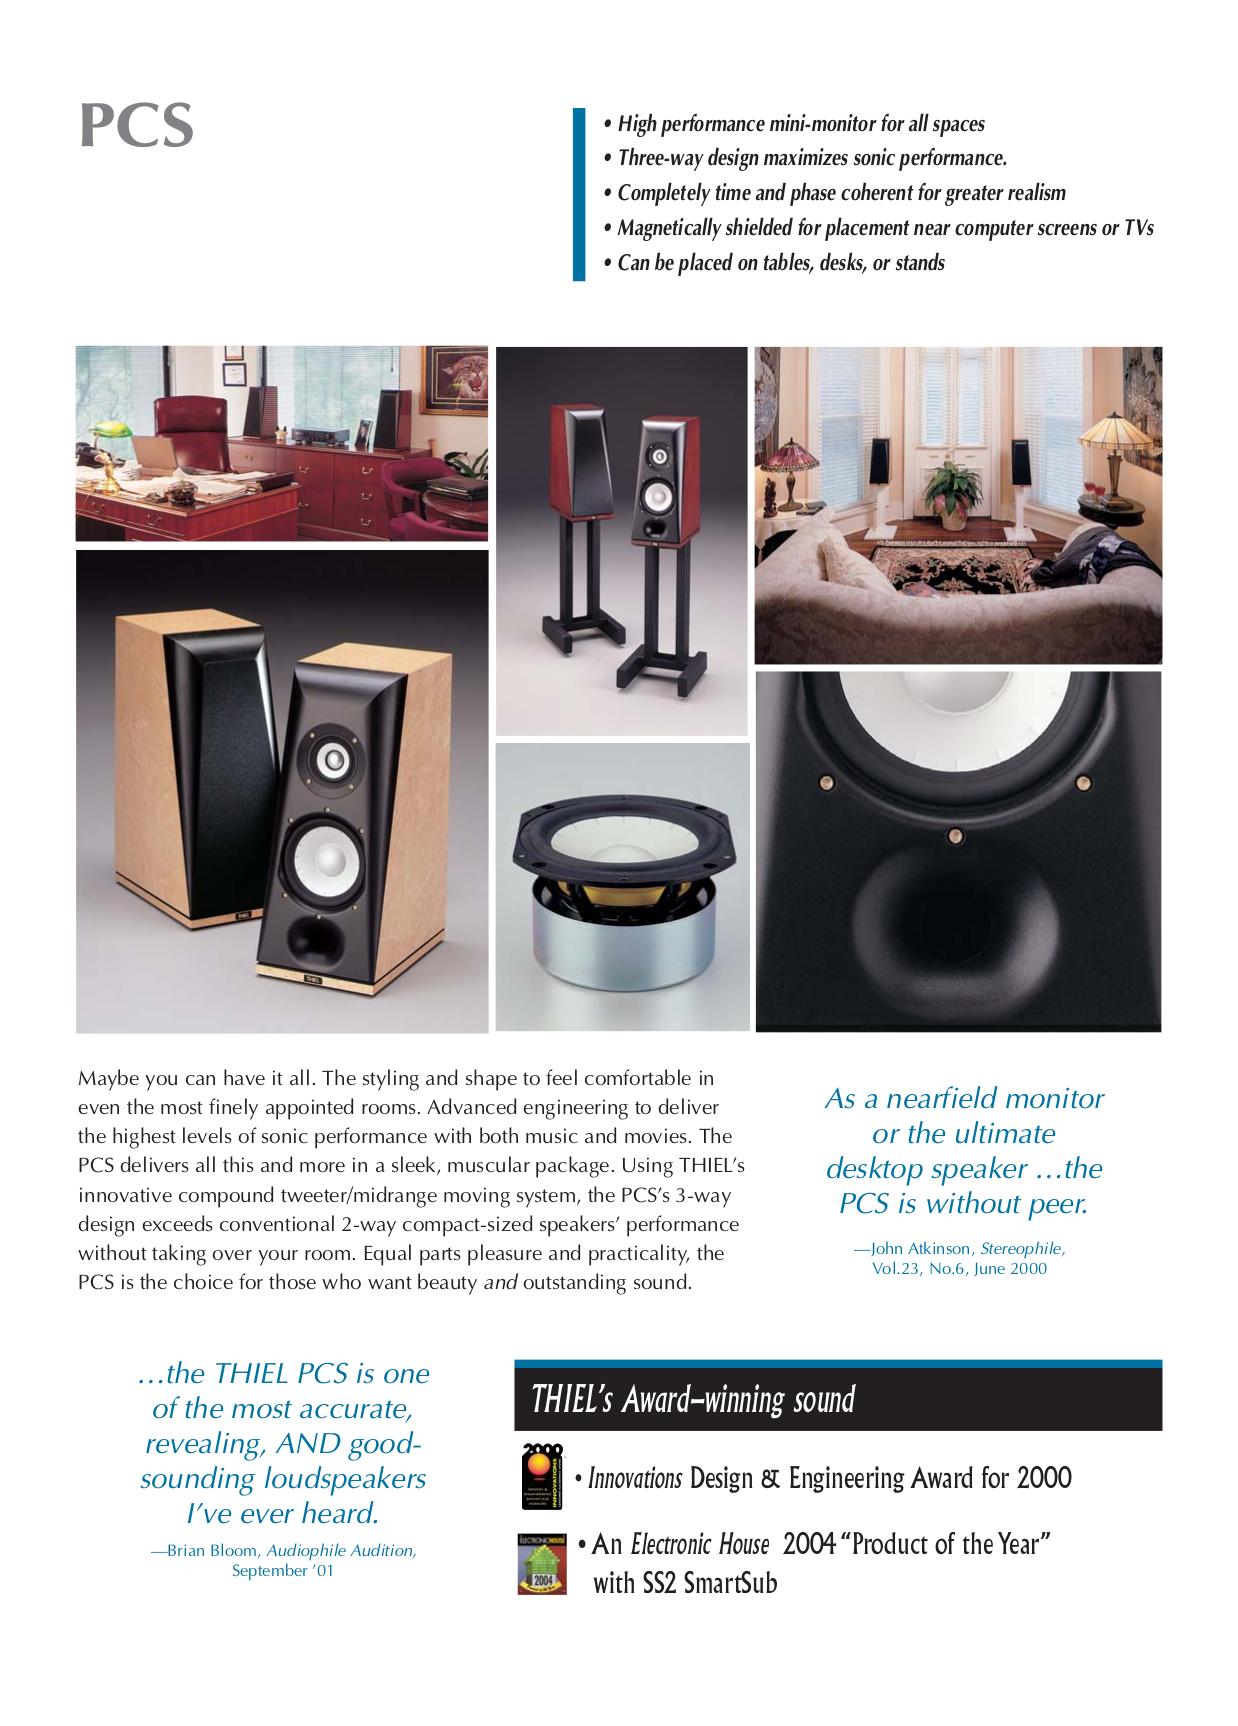 thiel pcs speaker ad thiel audio pinterest speakers rh pinterest co uk